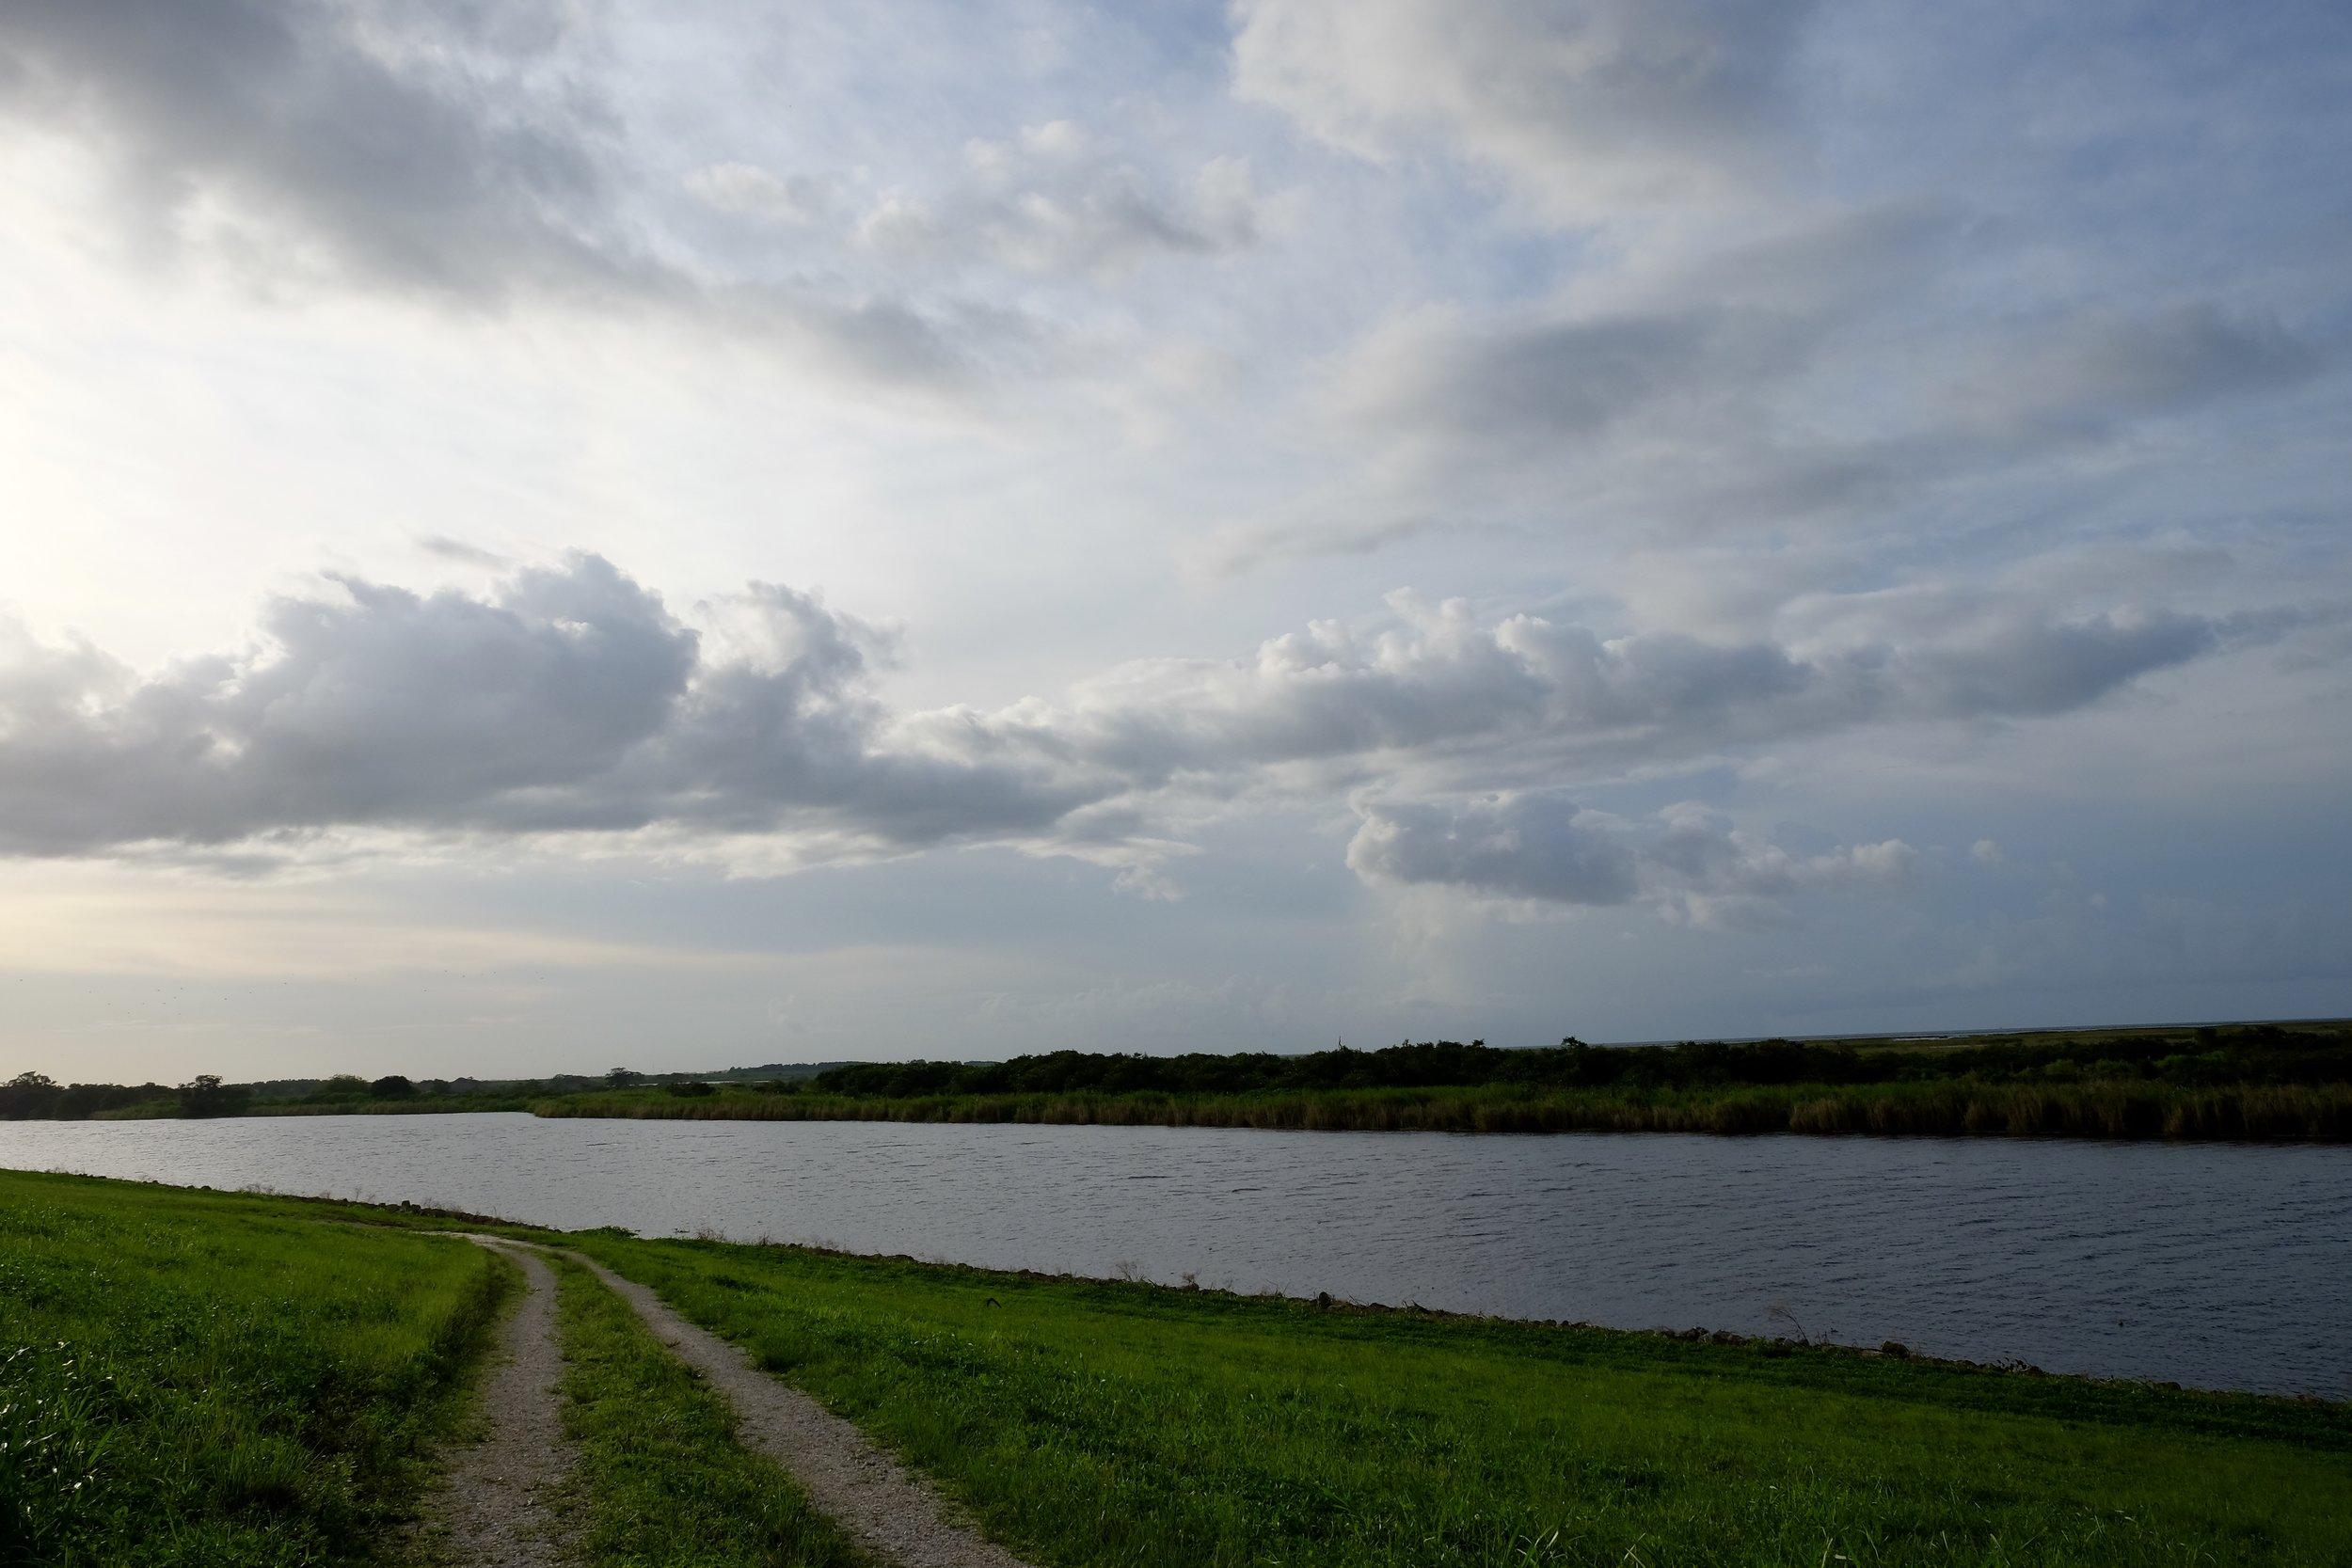 Lake Okeechobee: John Stretch Park